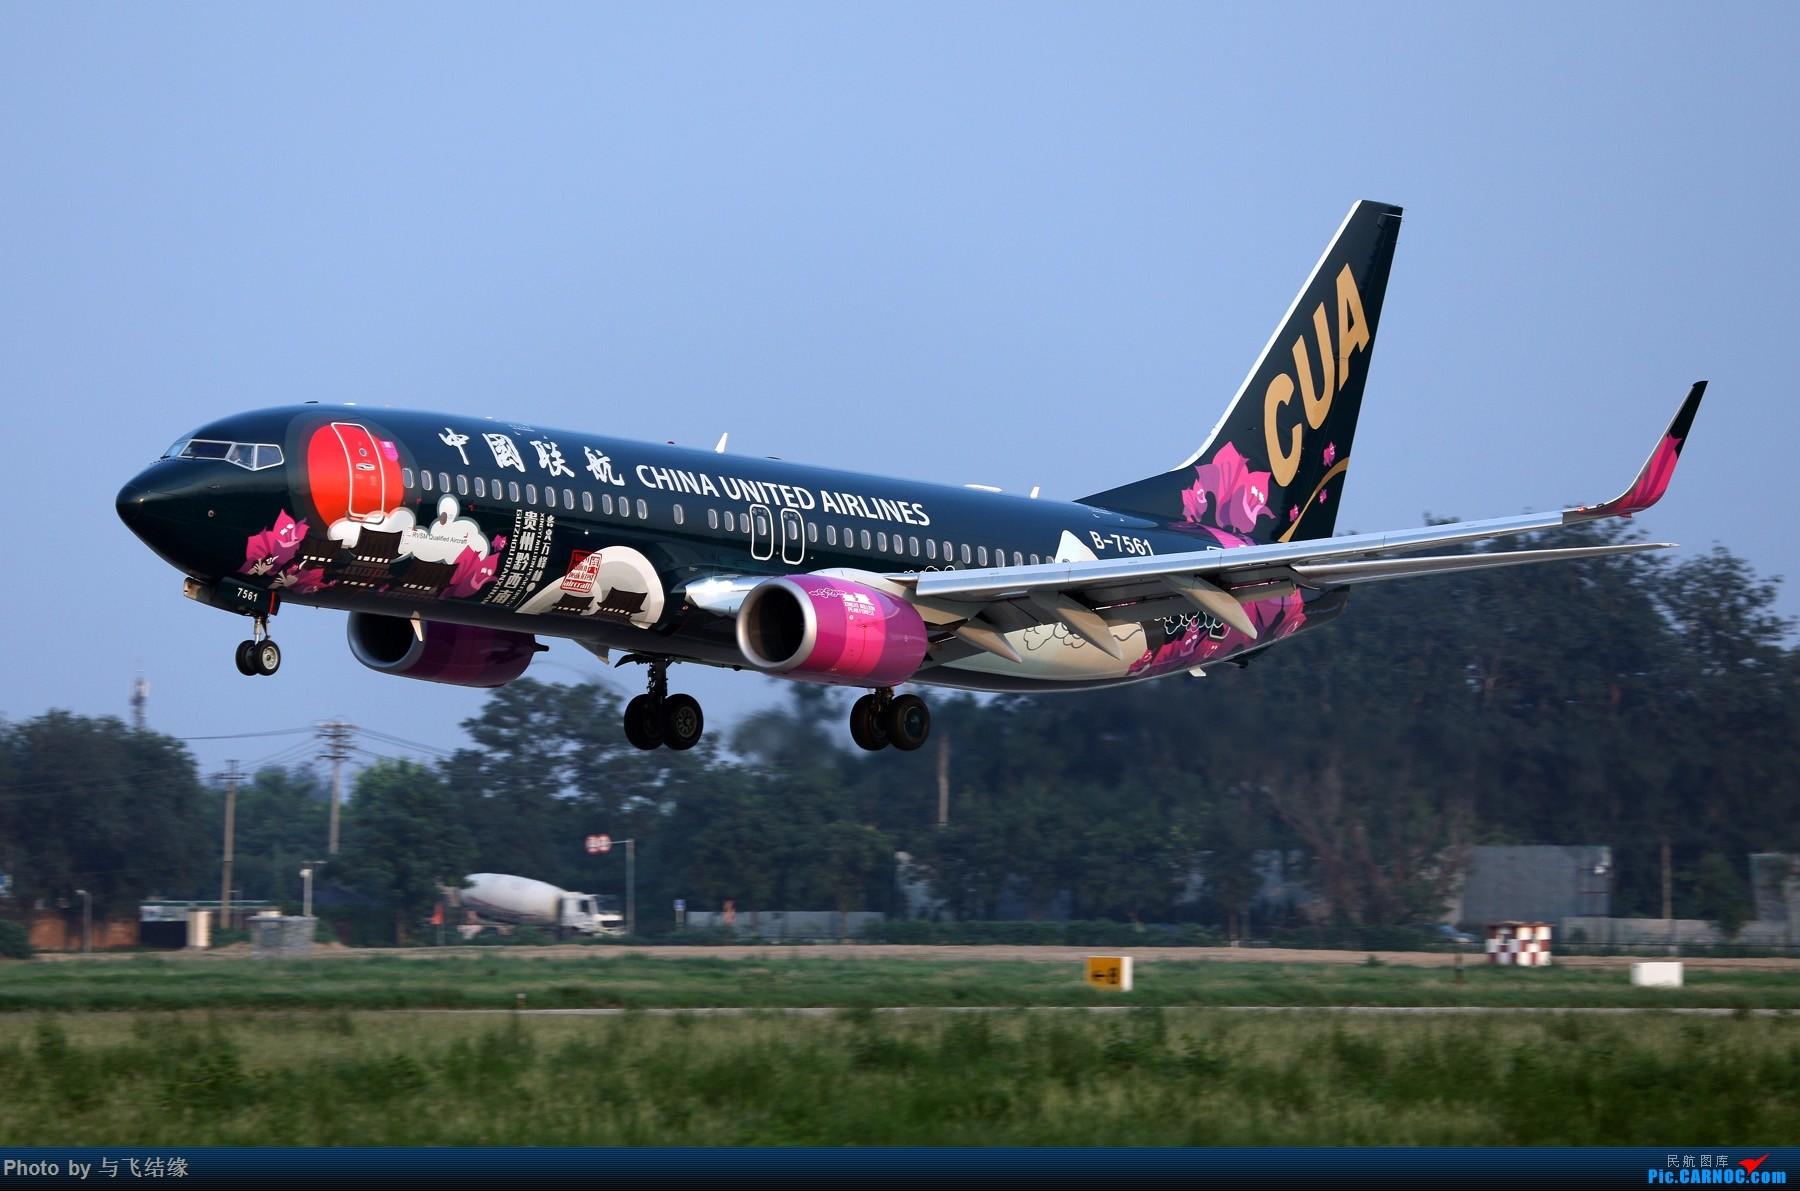 Re:[原创]要问彩绘哪家强,中国北京找联航。 BOEING 737-800 B-7561 中国北京南苑机场